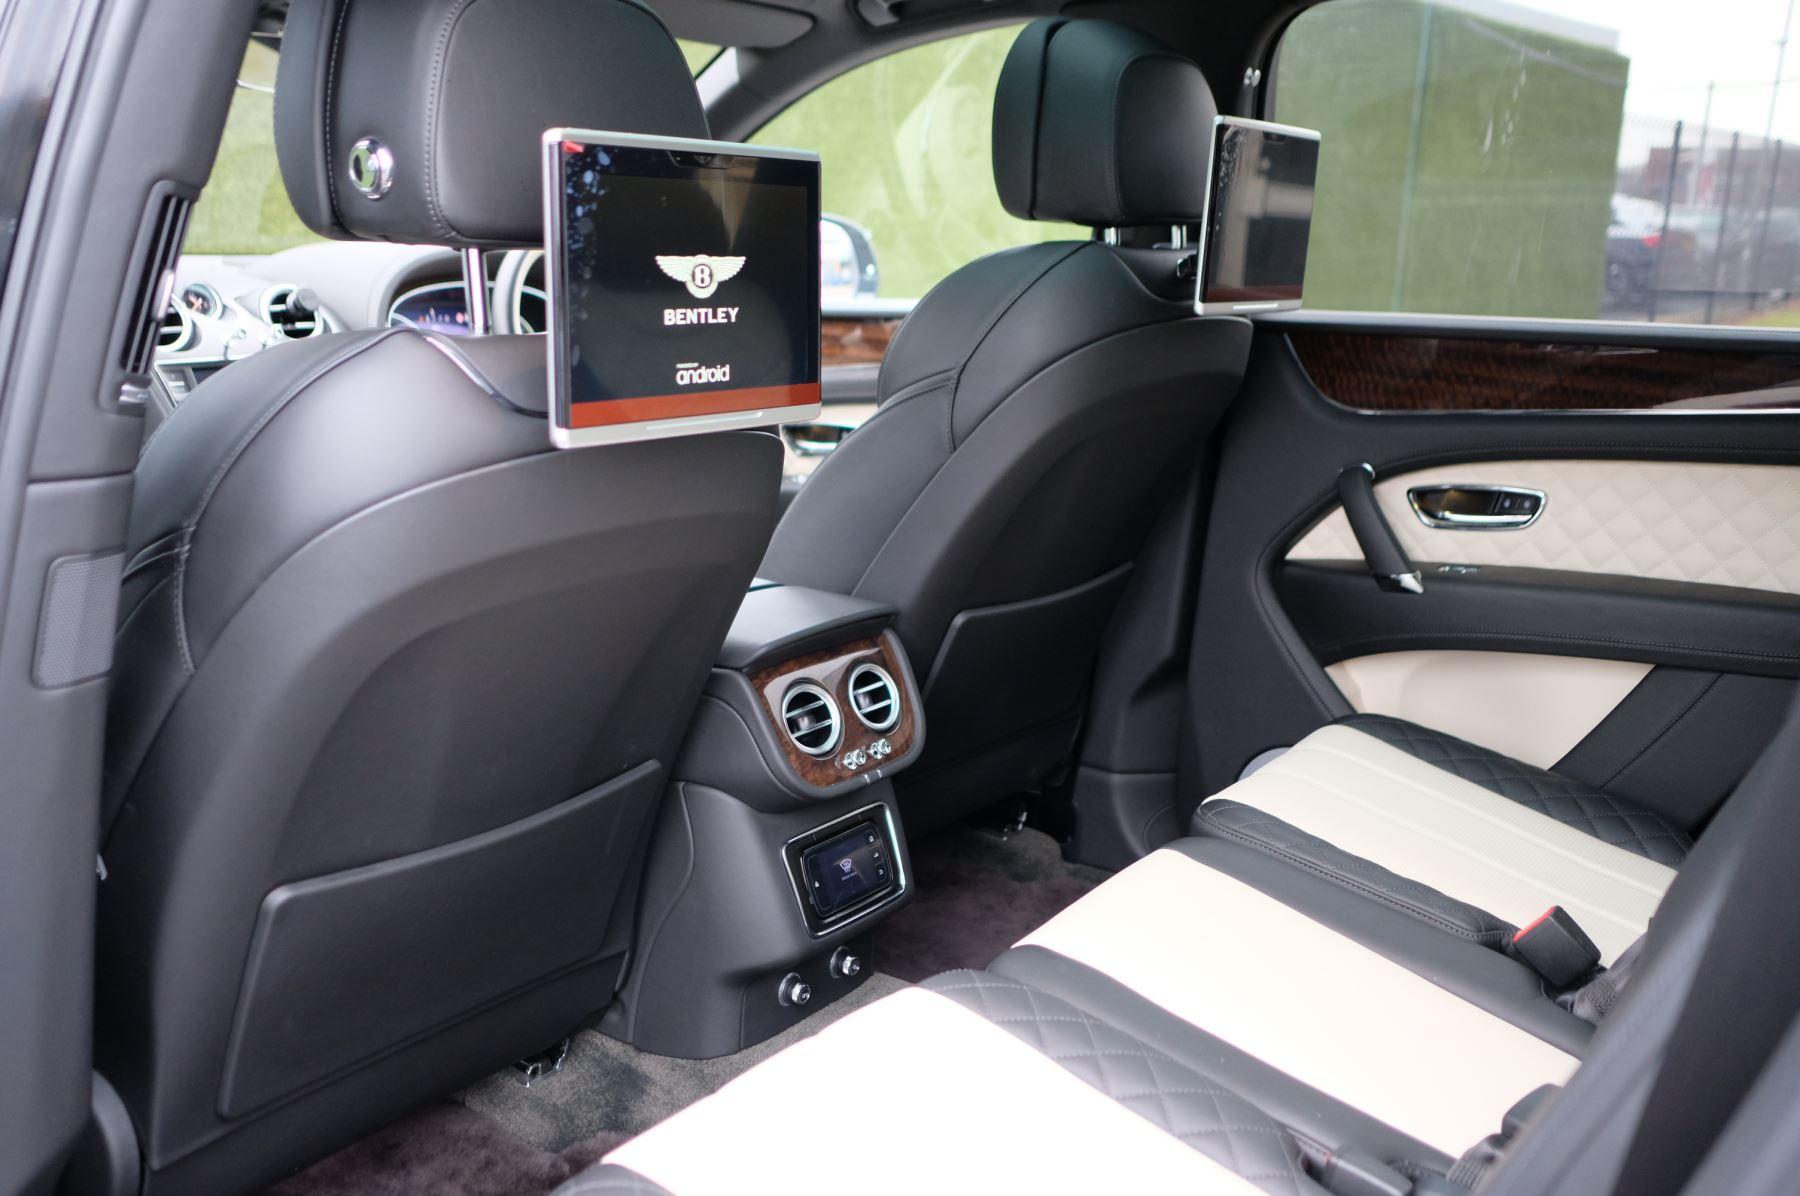 Bentley Bentayga Diesel 4.0 V8 Mulliner Driving Spec 5dr Auto - 7 Seat Specification image 14